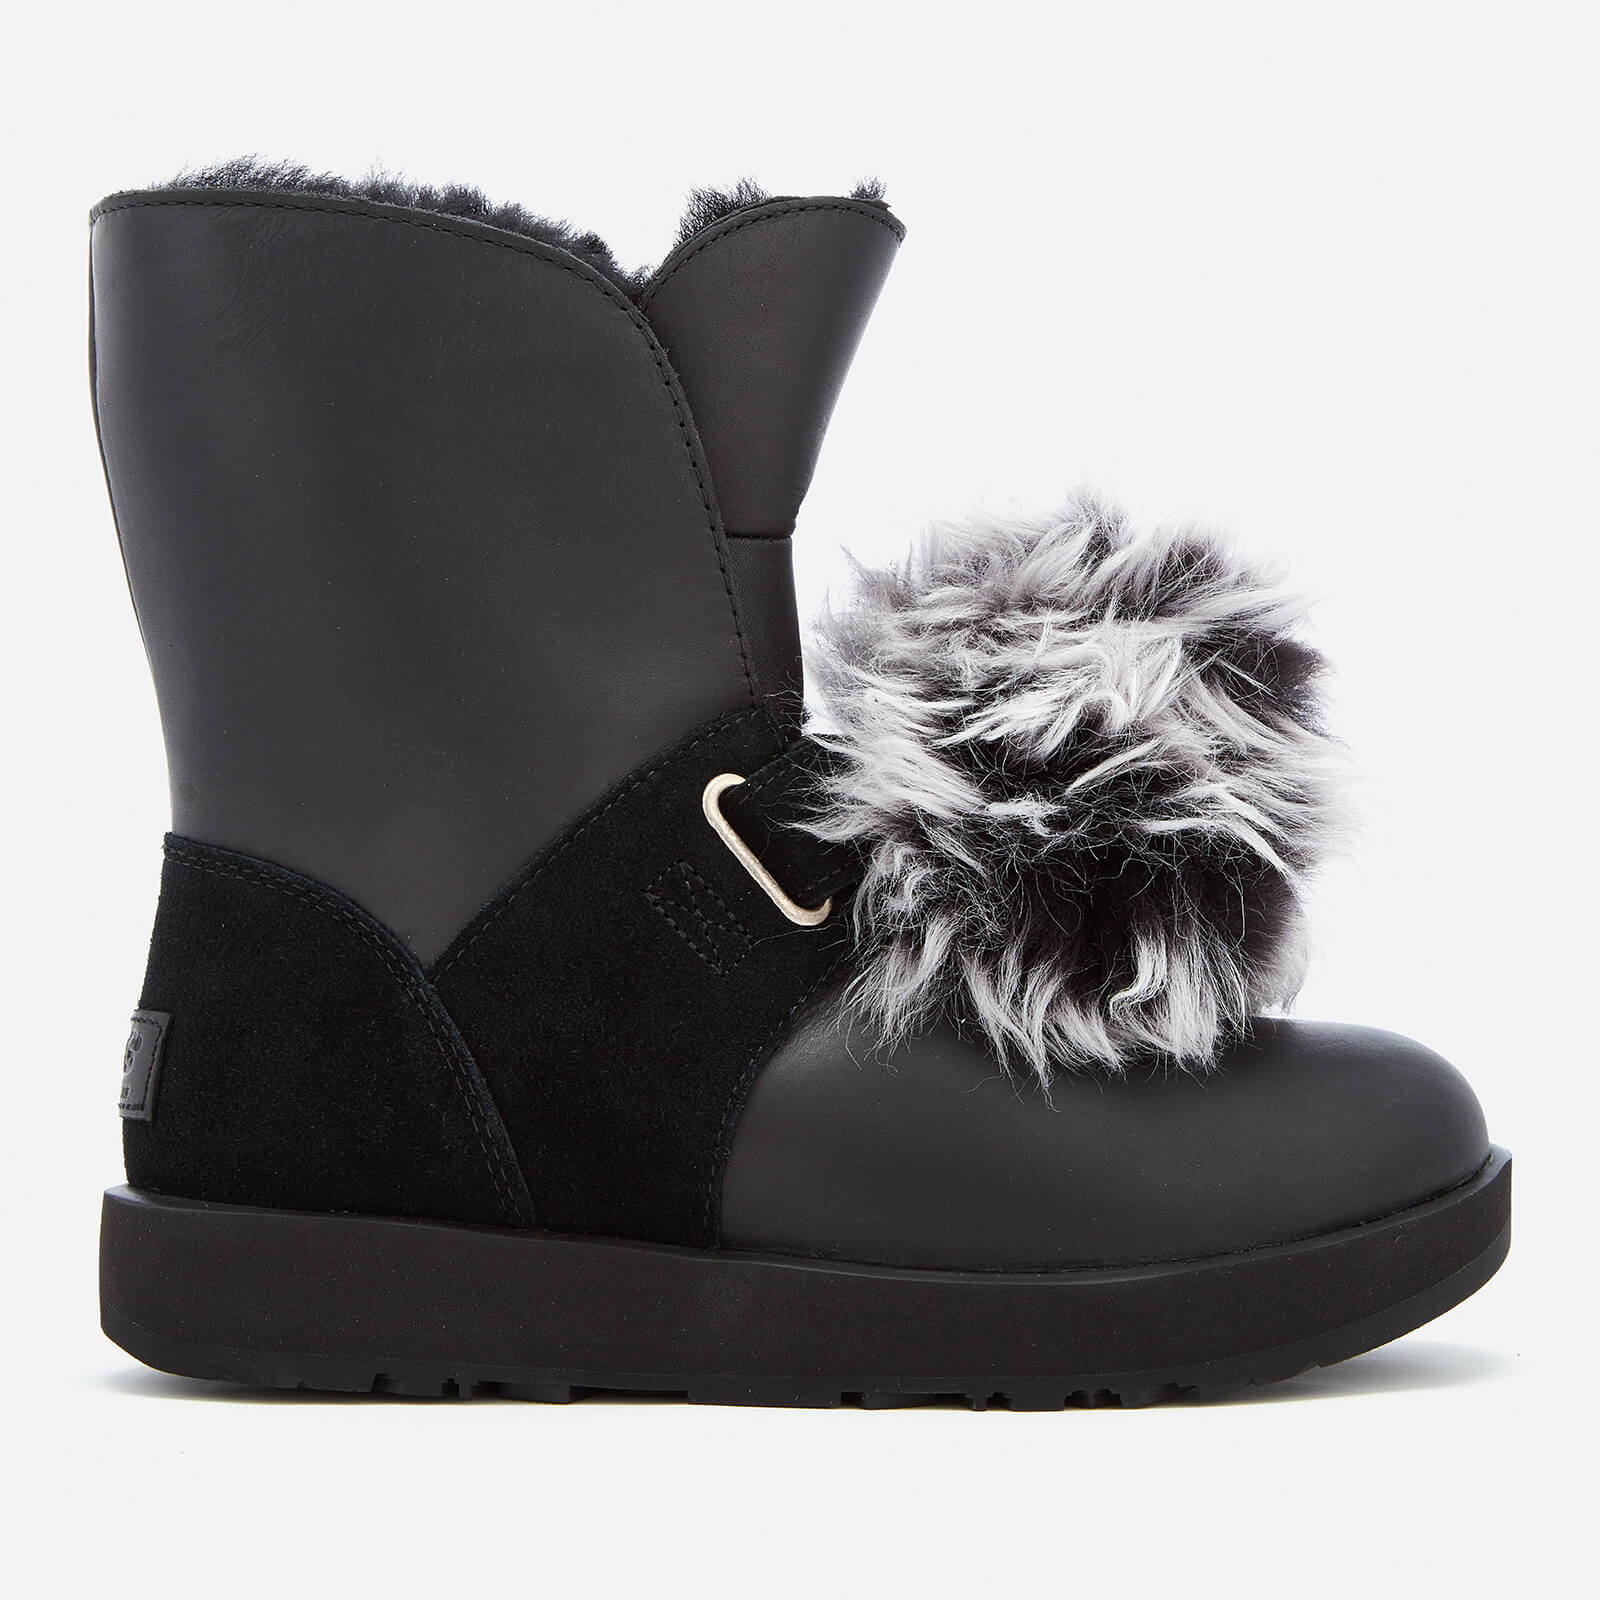 b2bf9a0d91f UGG Women's Isley Waterproof Pom Sheepskin Boots - Black